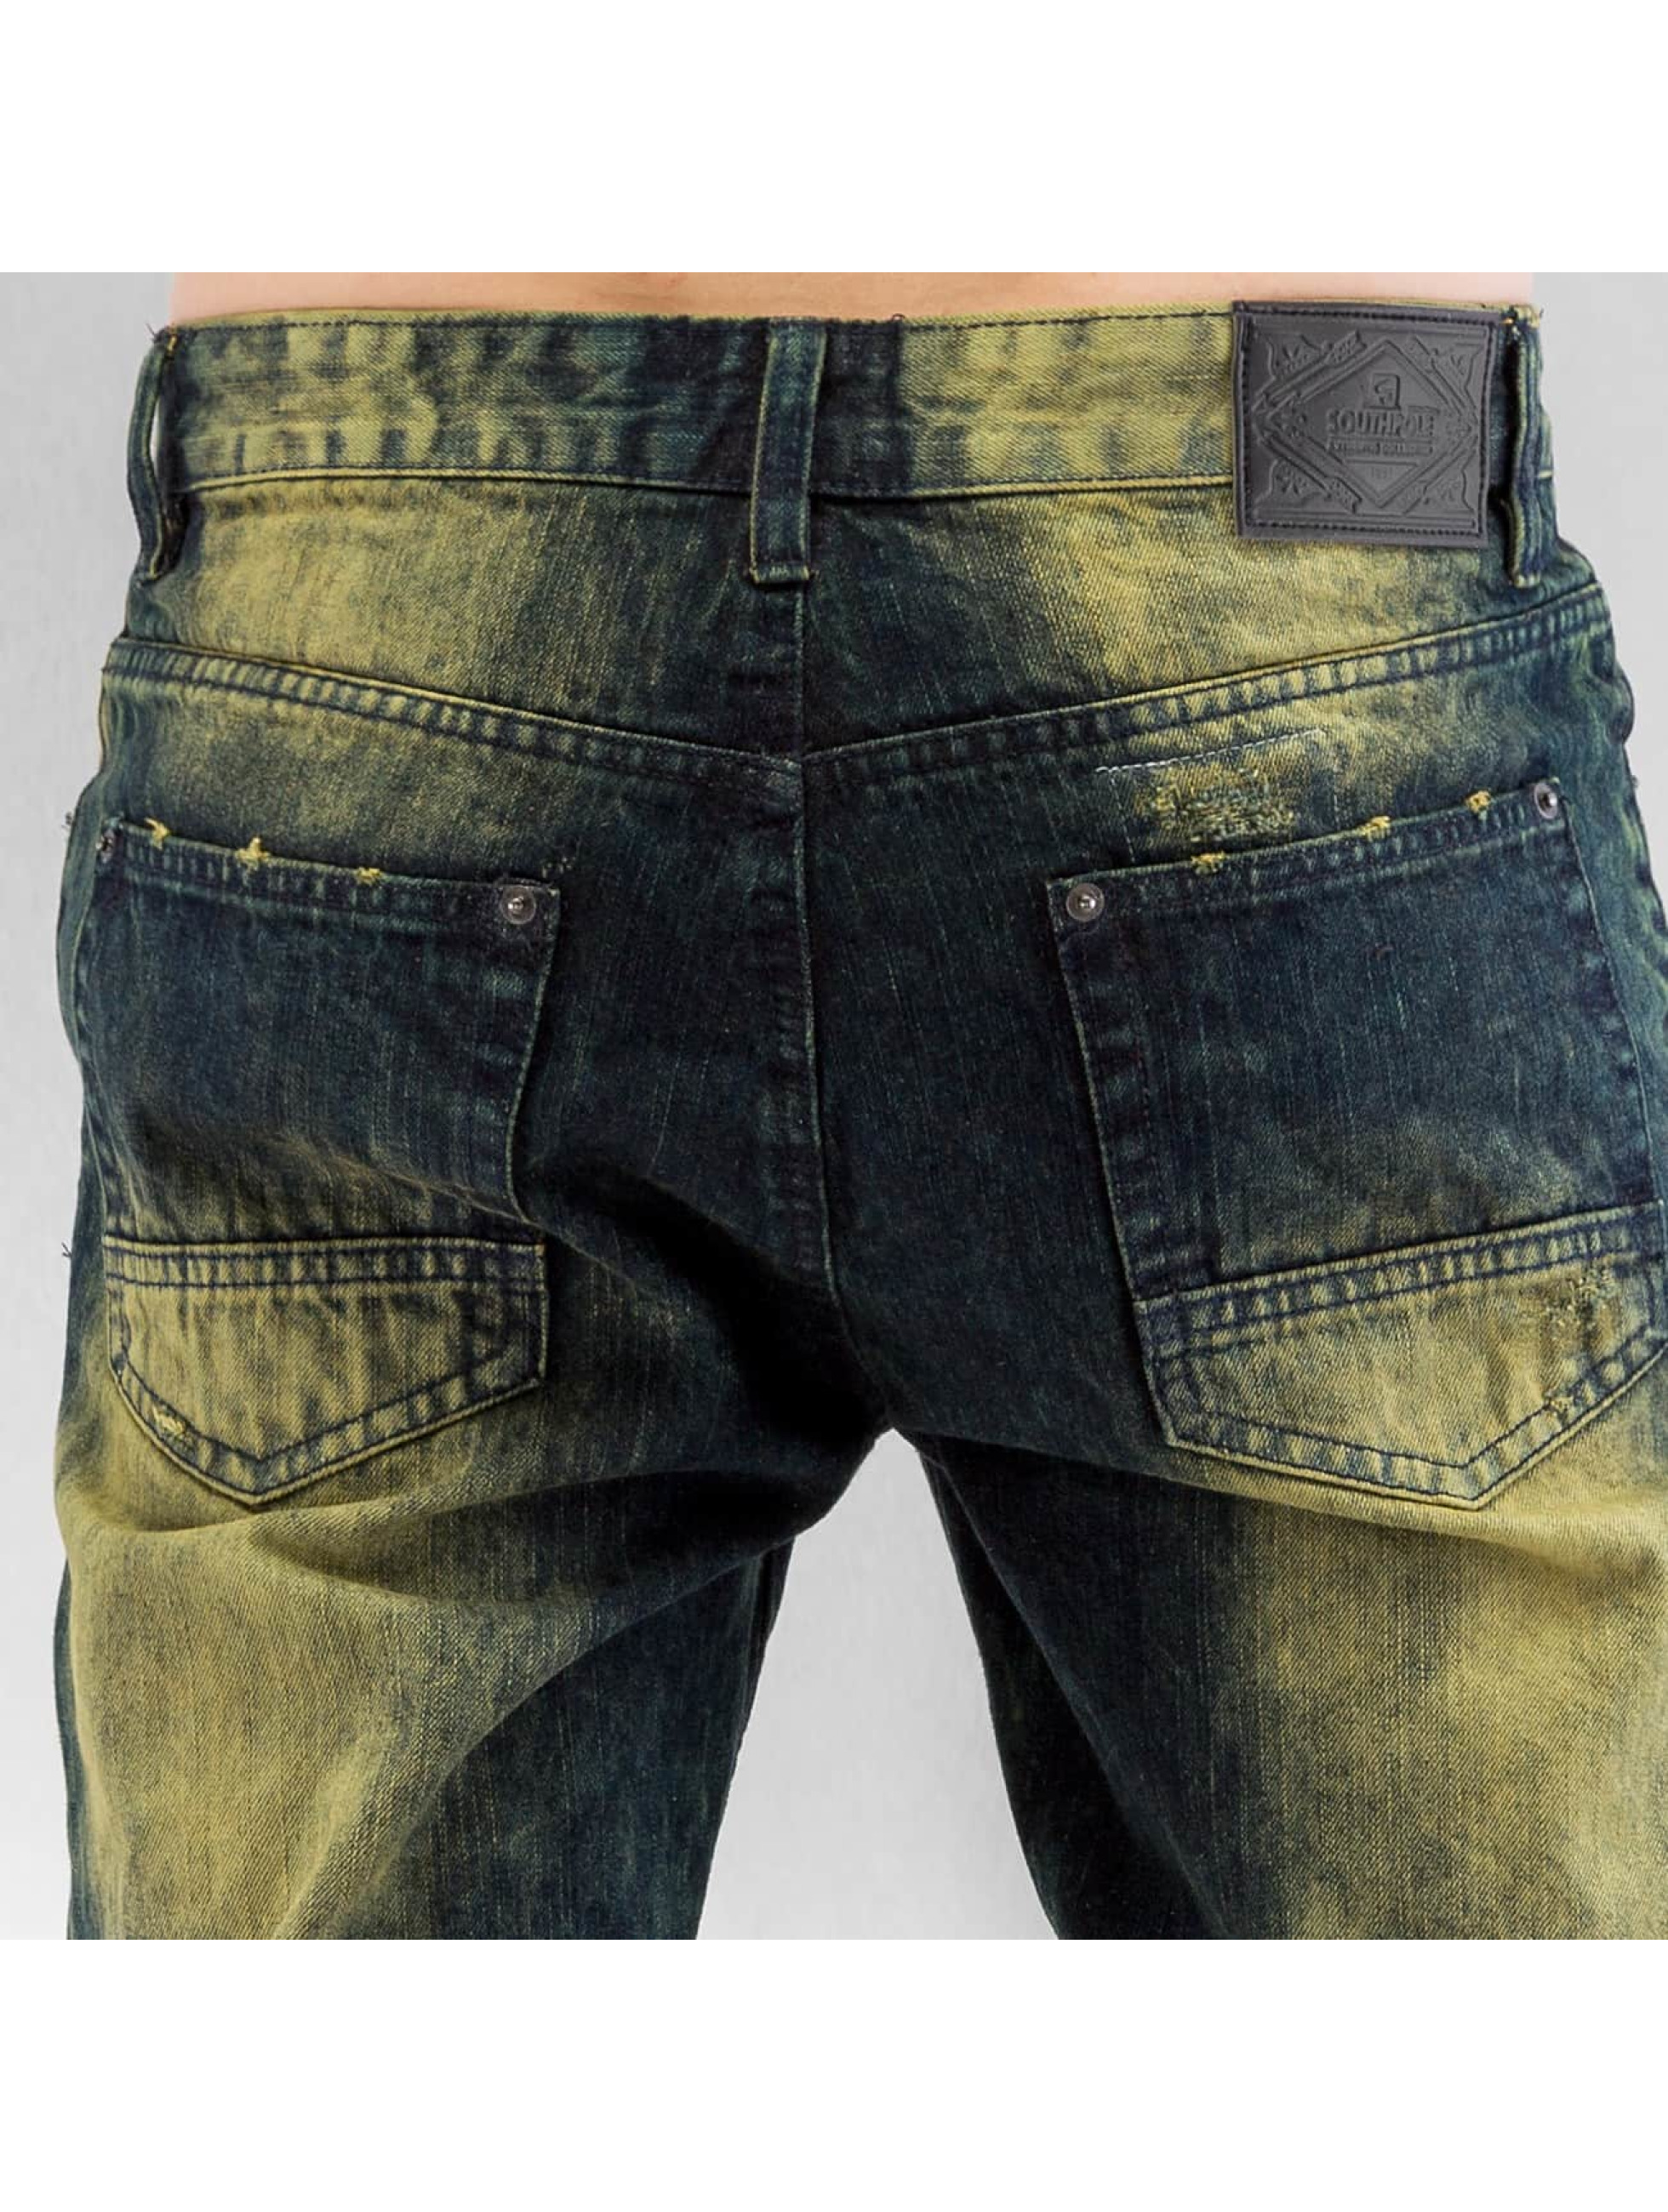 Southpole Slim Fit Jeans Ripped Slim indigo